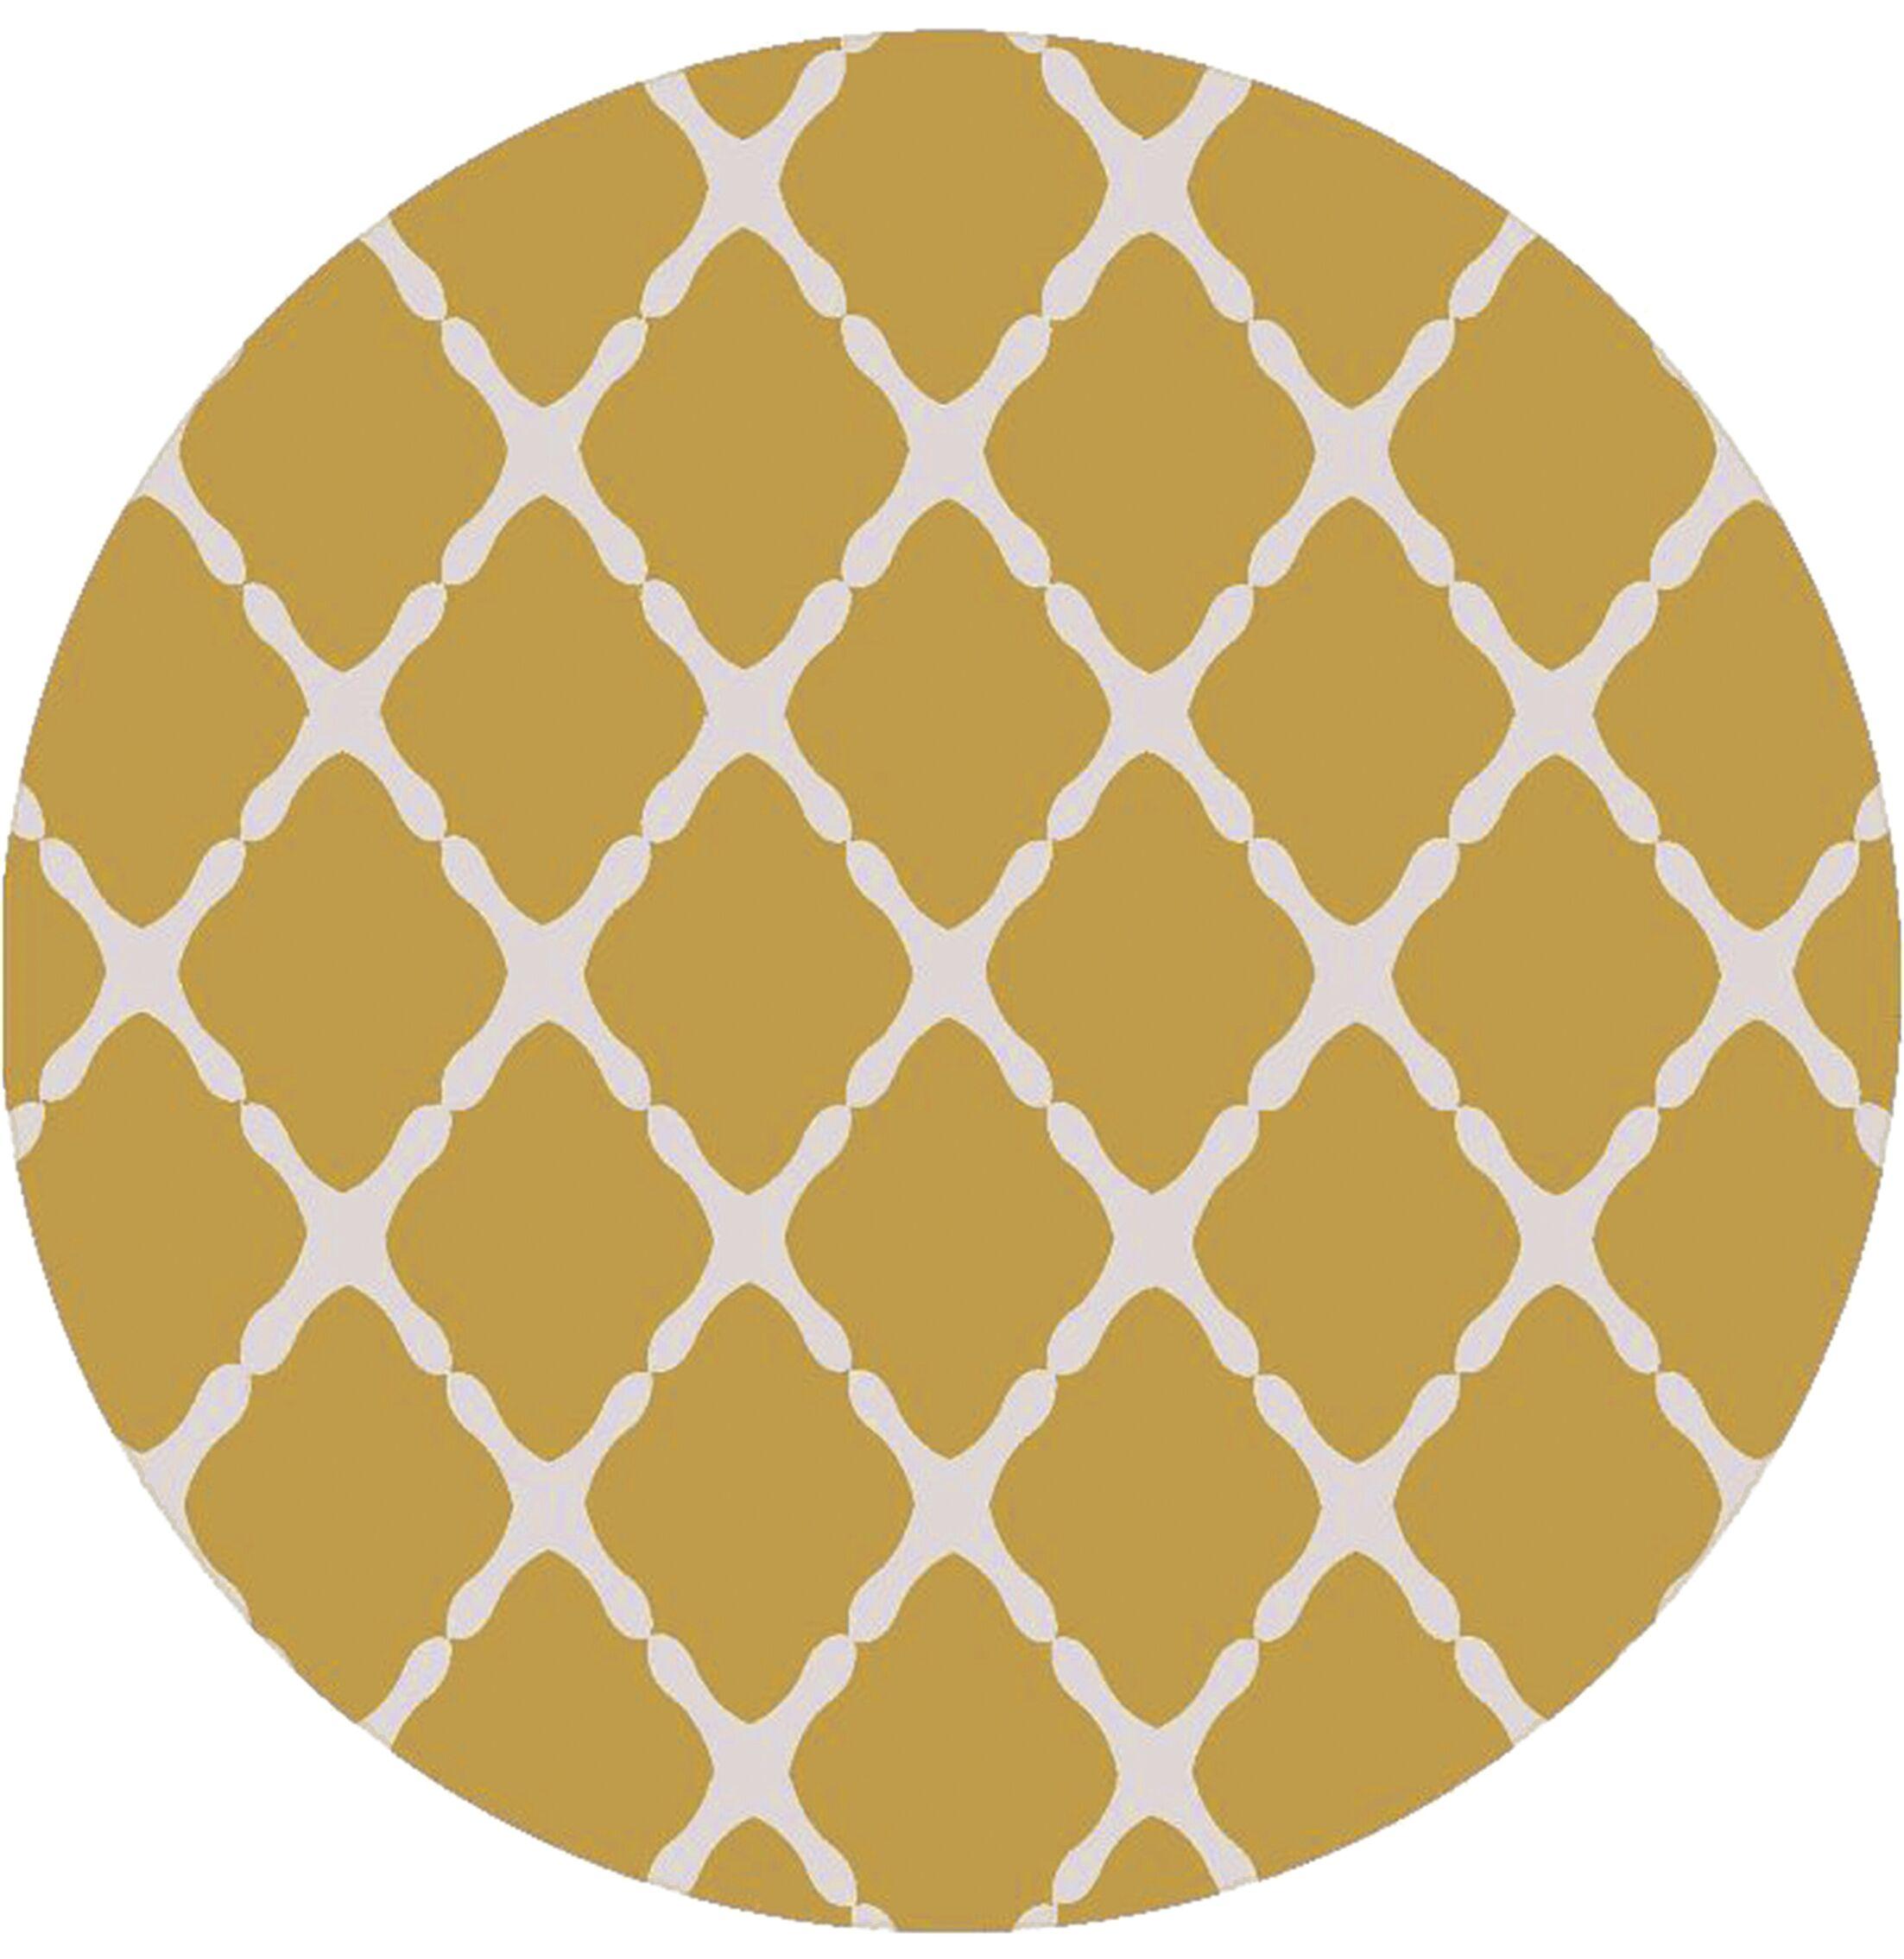 Dixfield Gold Indoor/Outdoor Area Rug Rug Size: Rectangle 9' x 12'